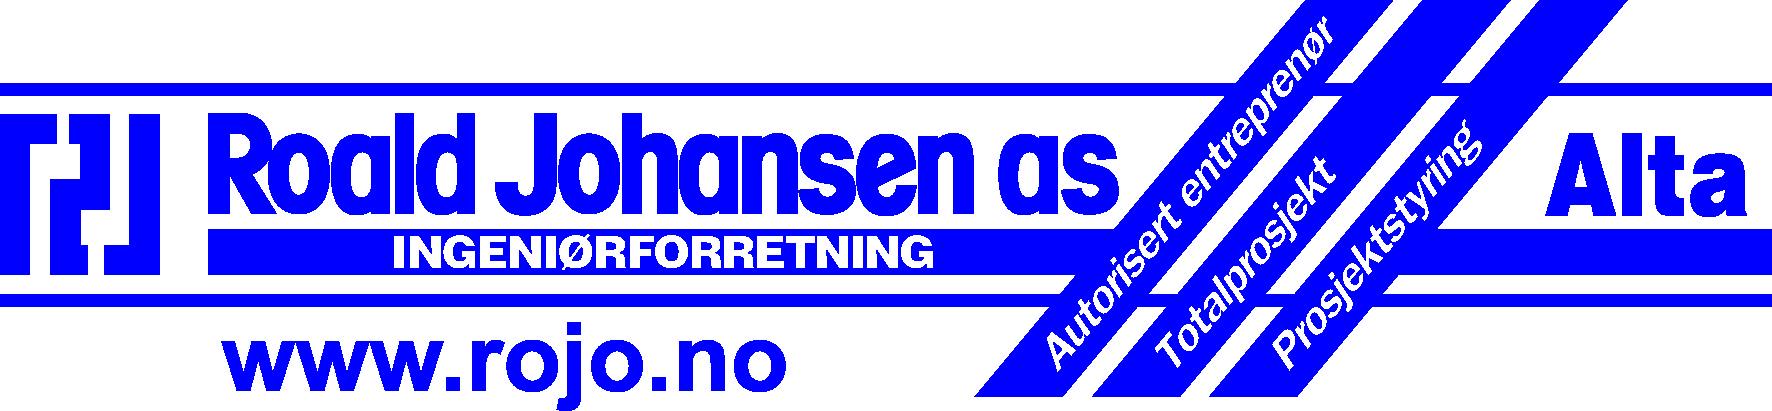 Roald Johansen AS